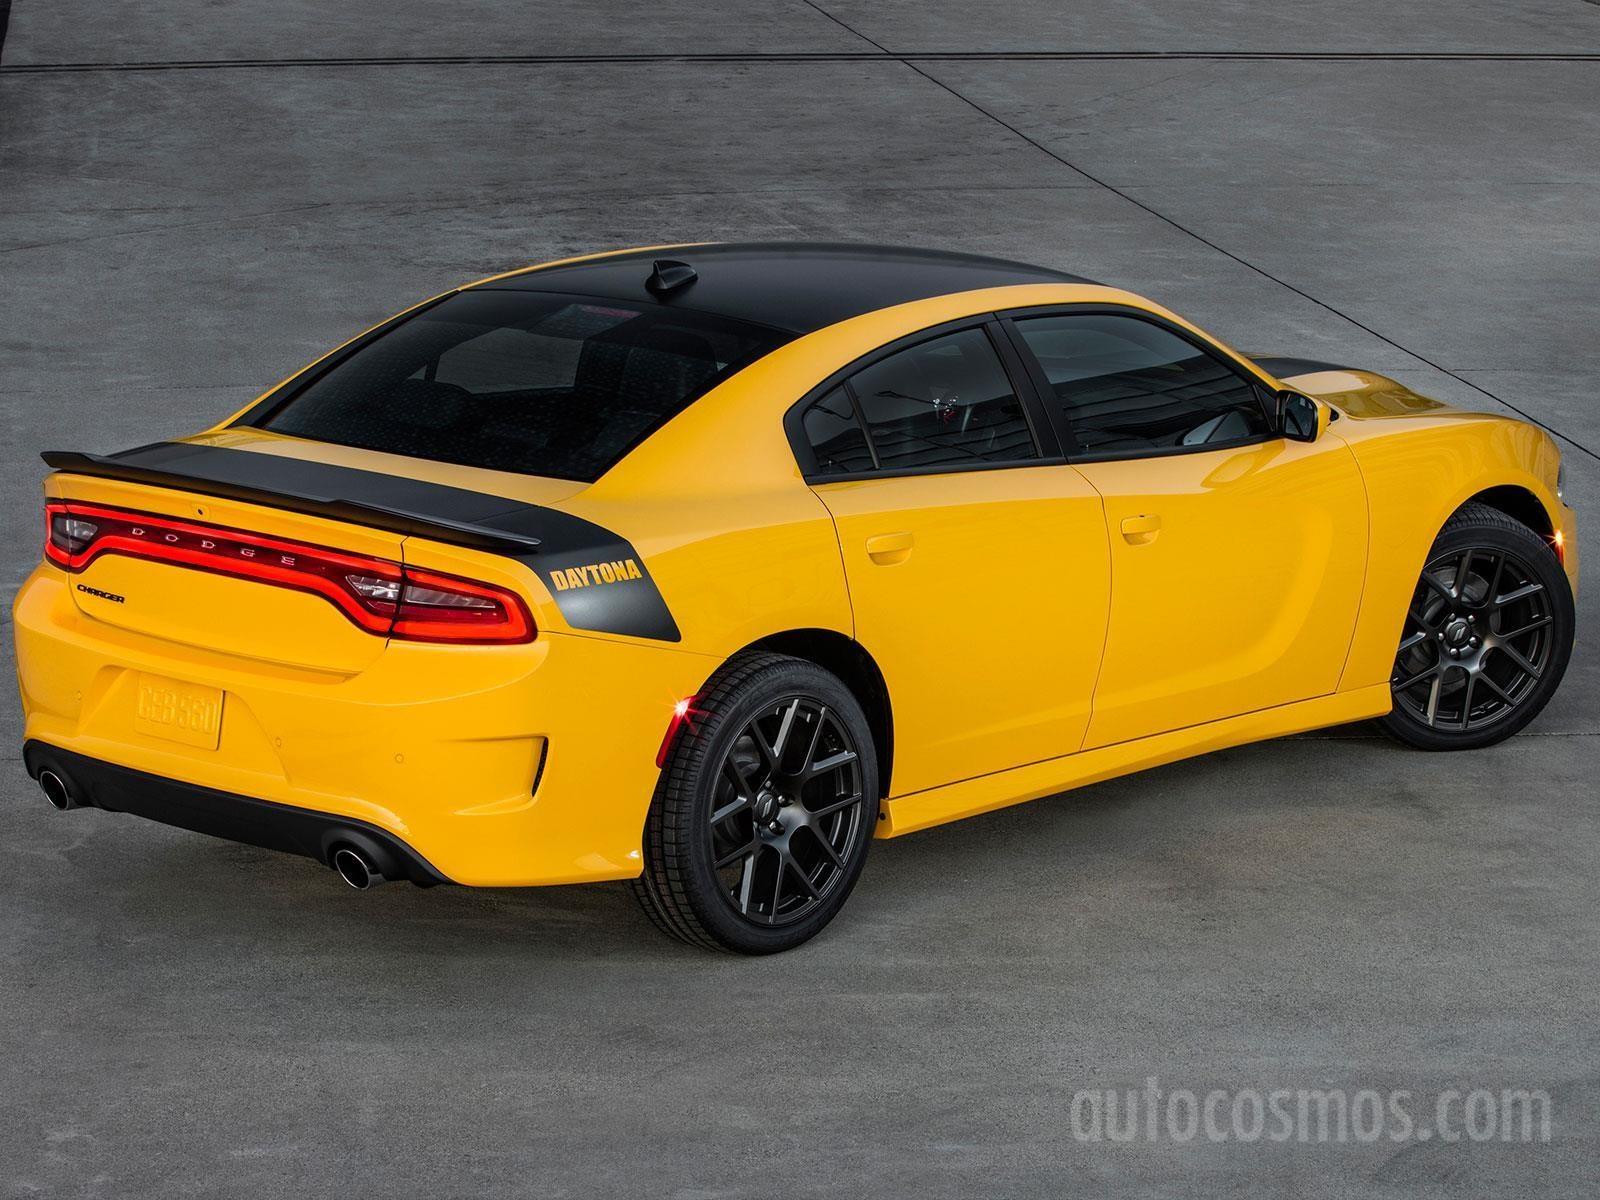 Dodge Charger Daytona 2017 - Autocosmos.com